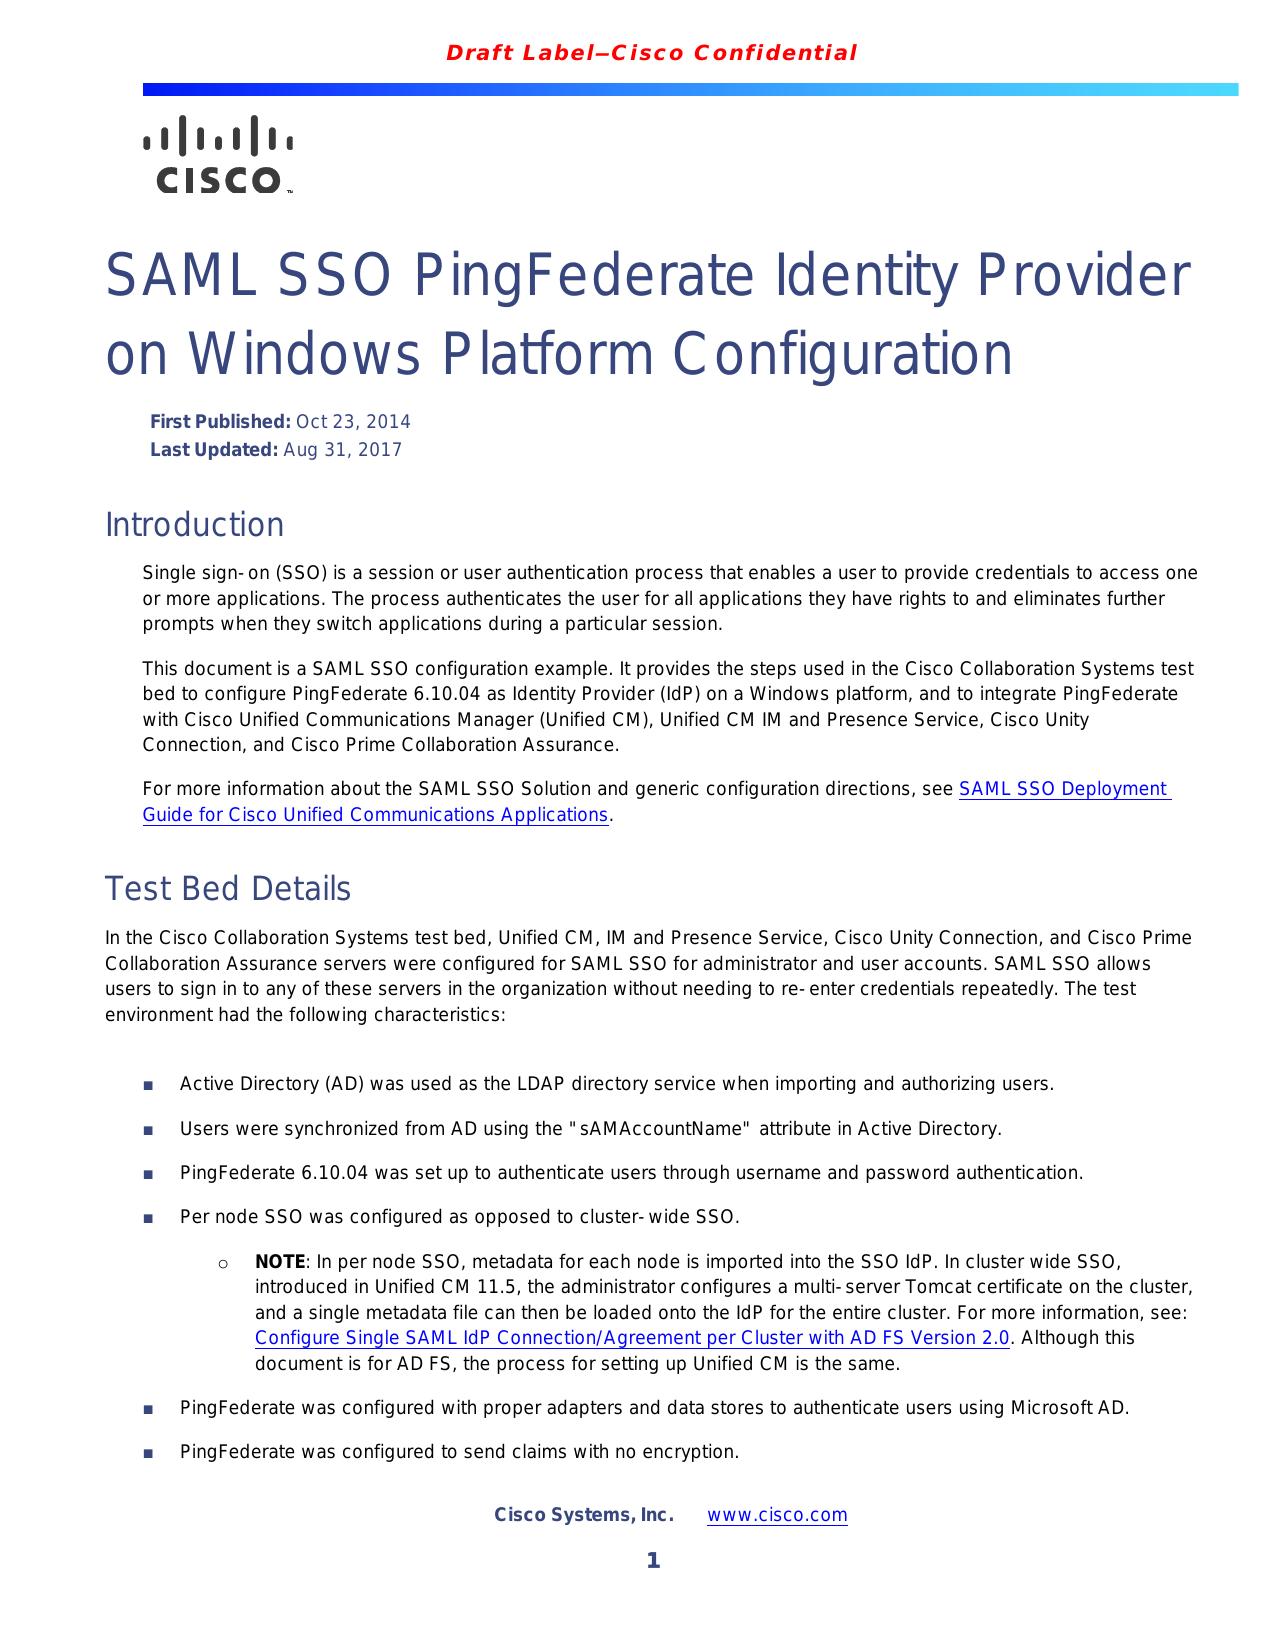 SAML SSO PingFederate Identity Provider on Windows